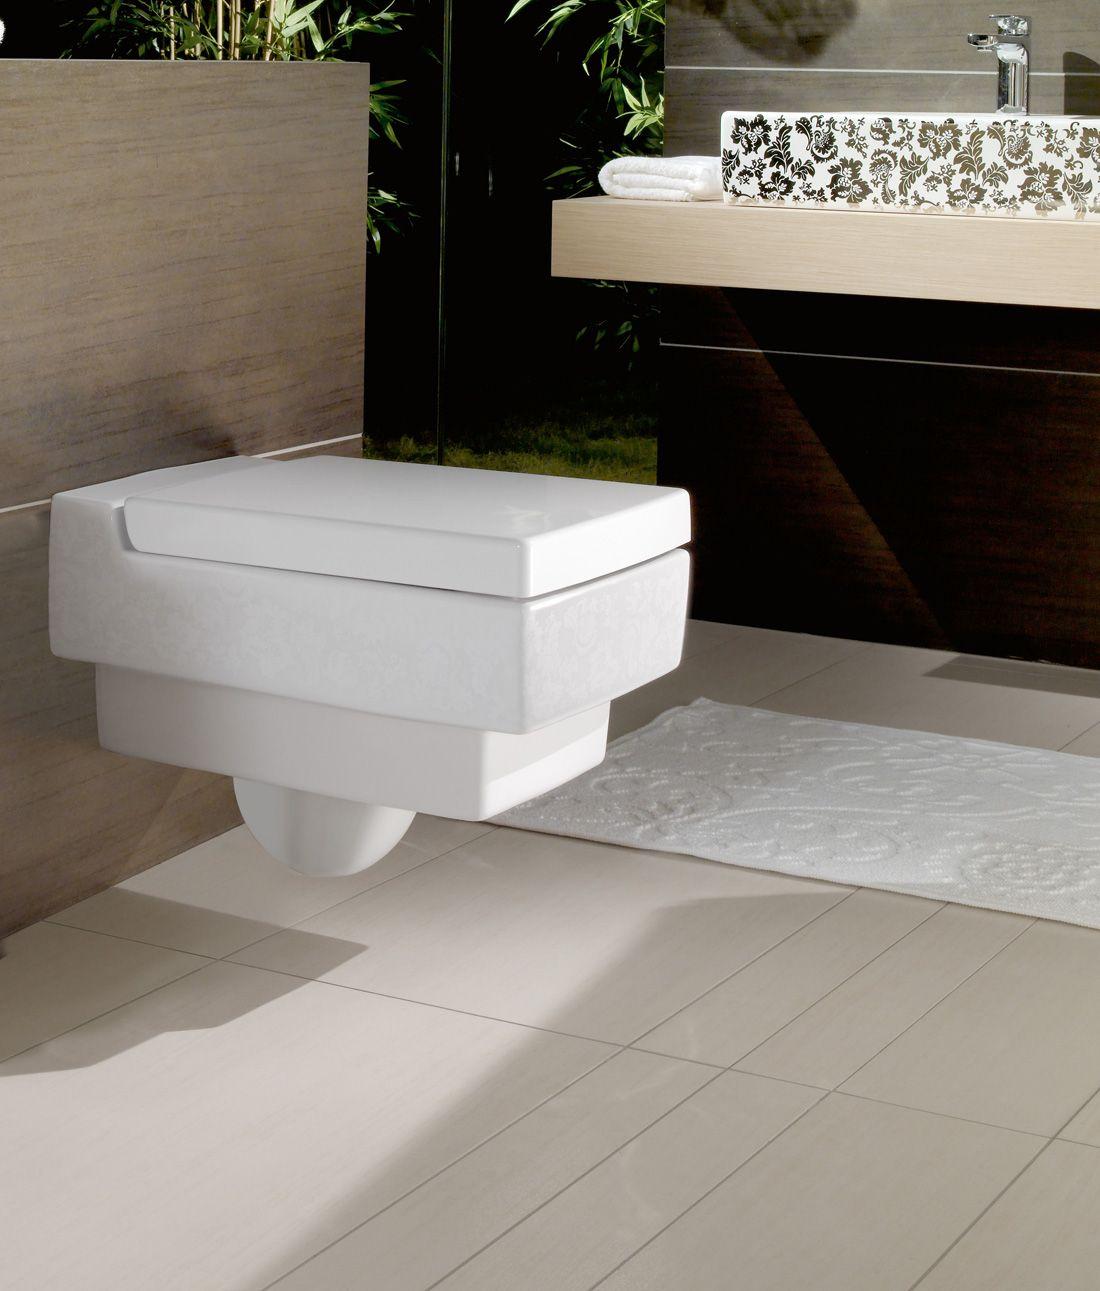 Sleek Bathroom Collection Focusing On The Essential Memento